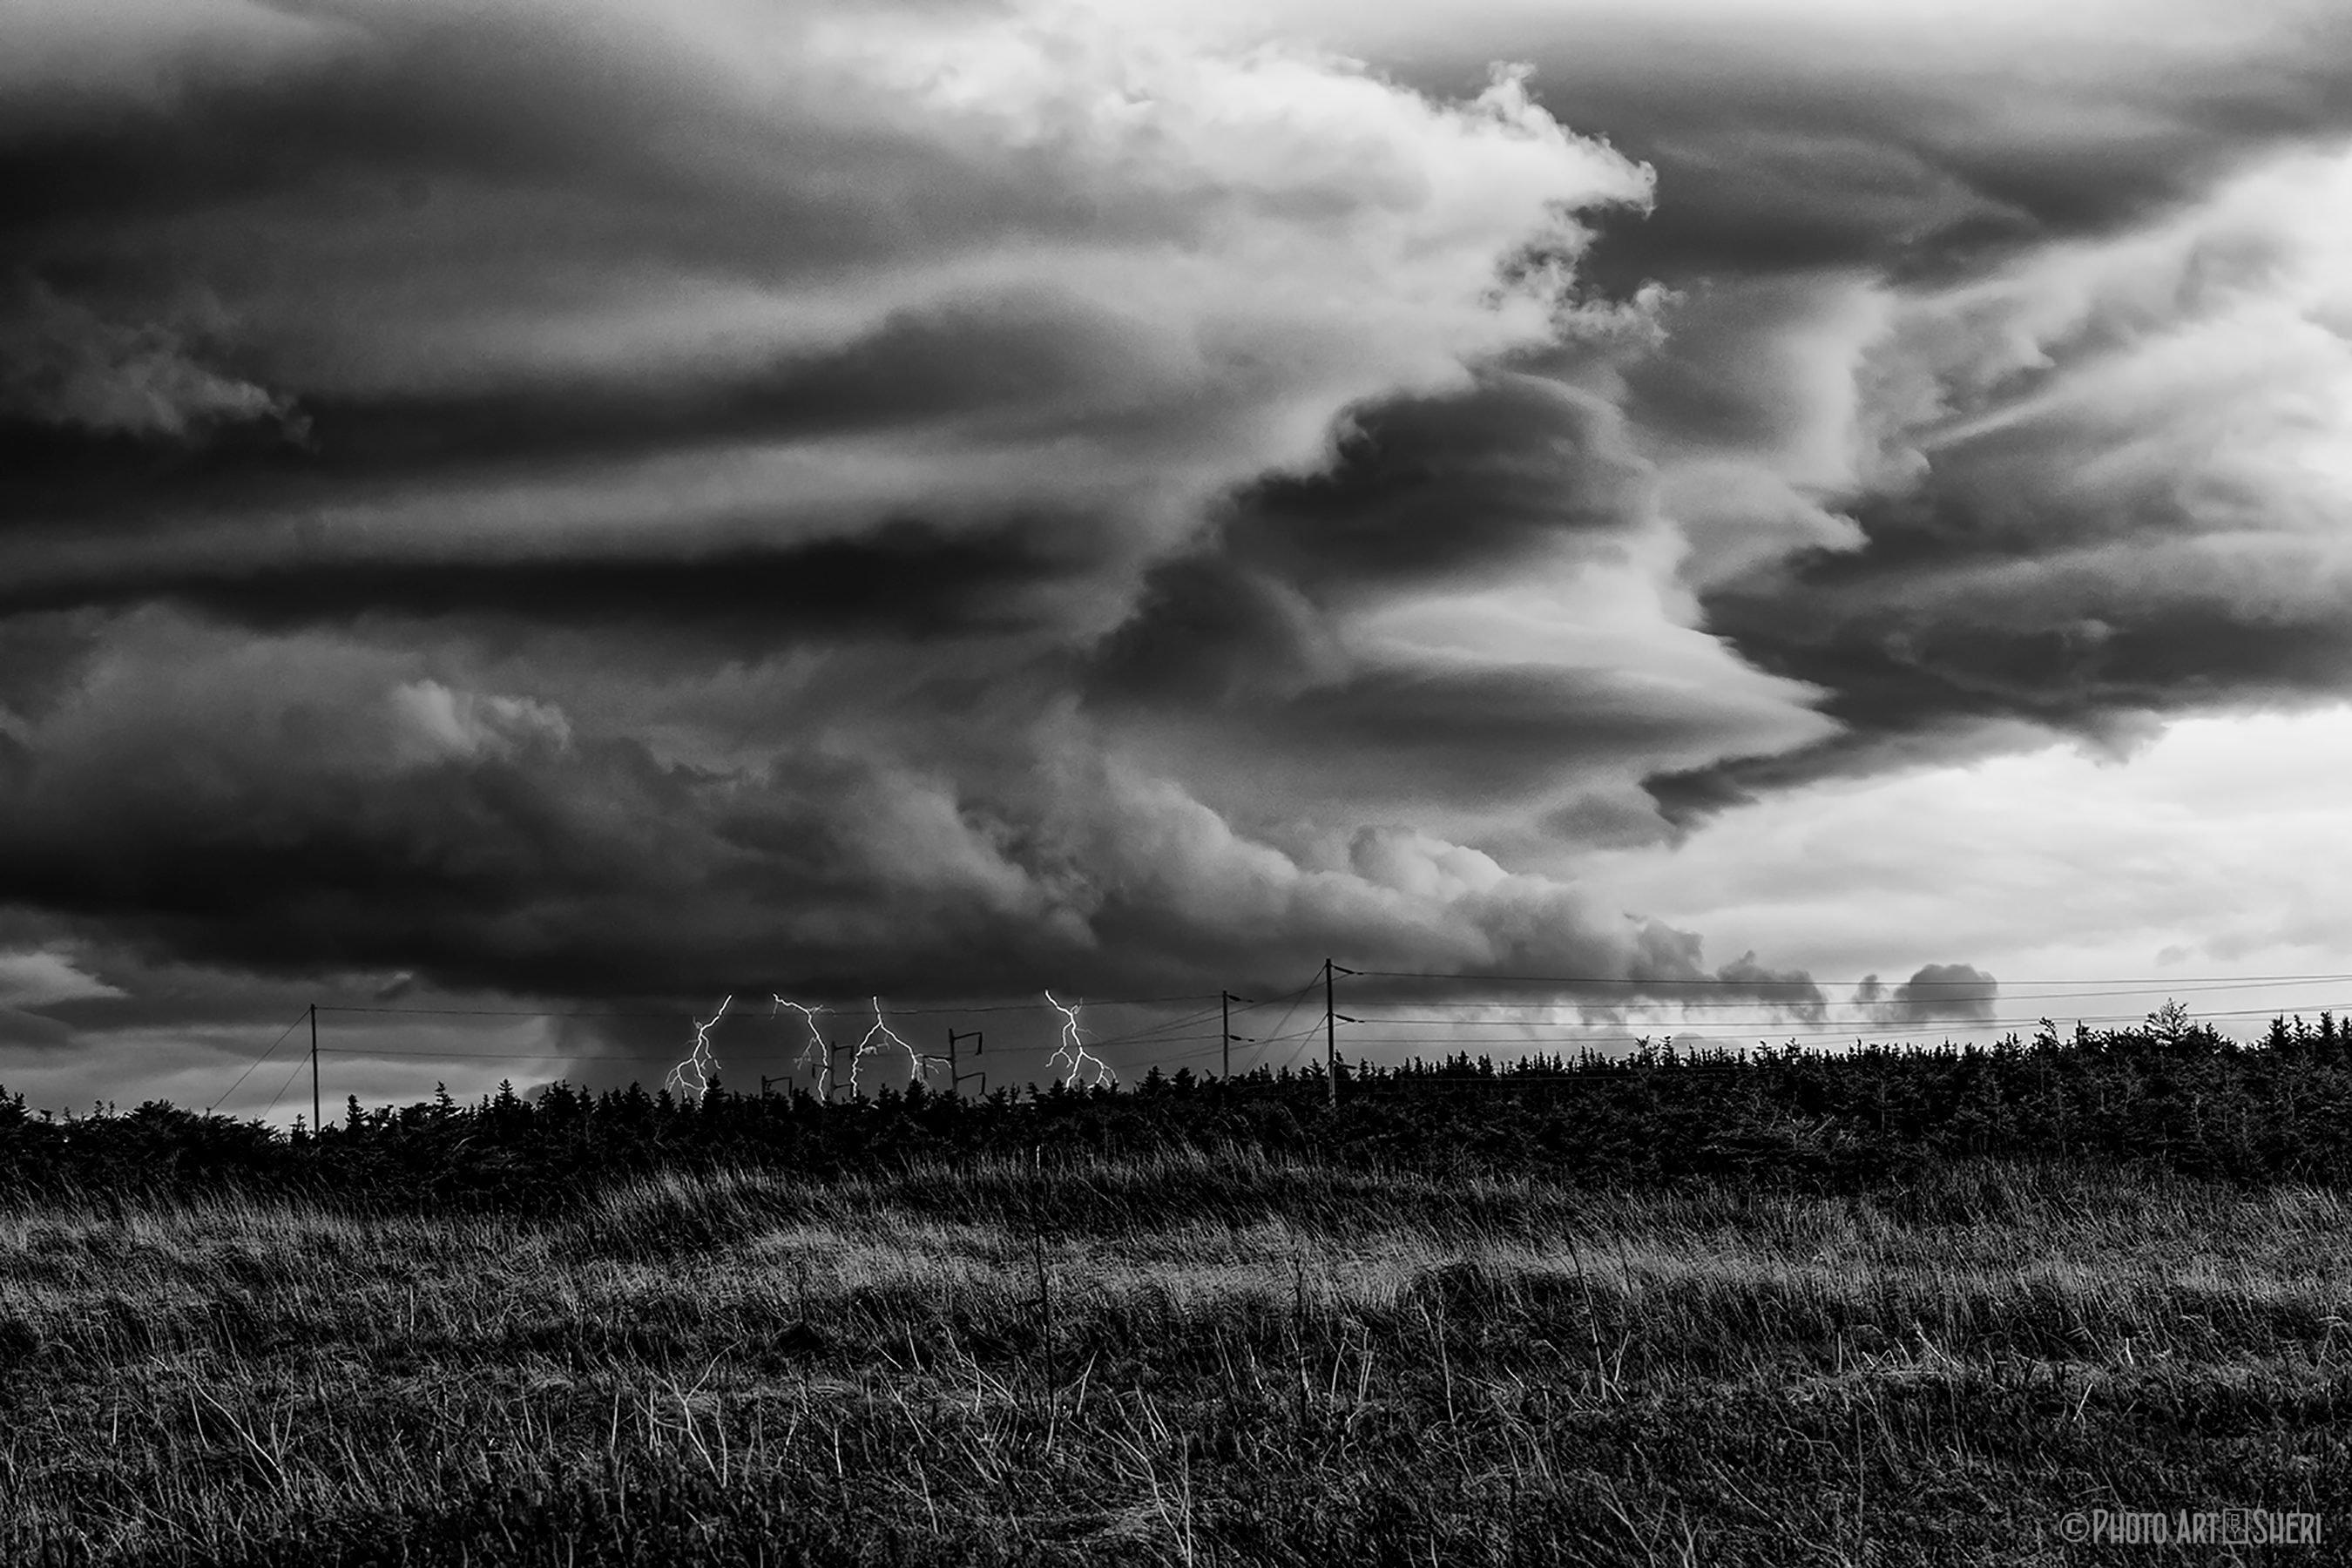 sheri-sanders-storm